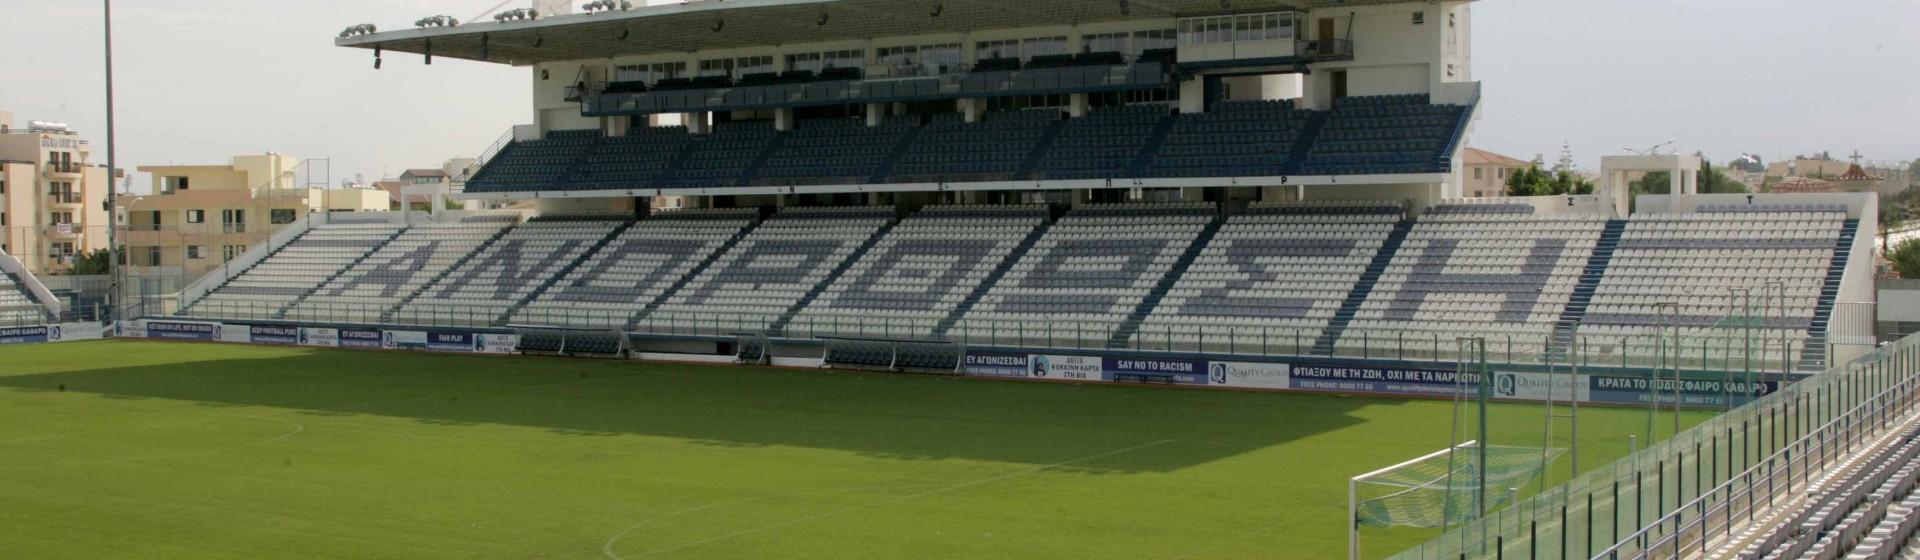 Stadium-Anorthosis-Famagusta-1920x560